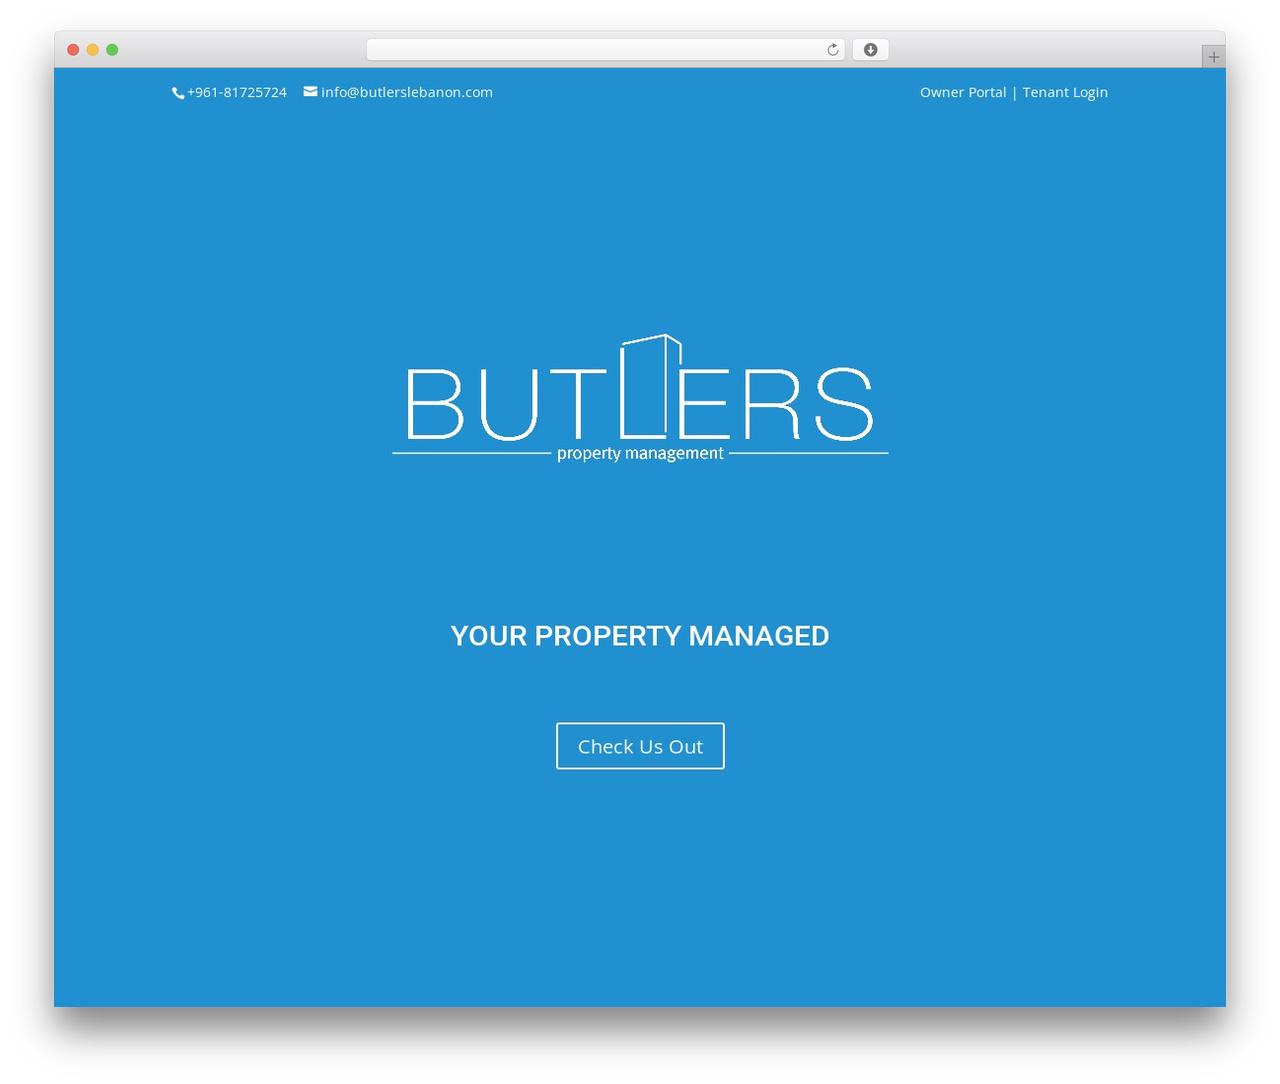 Divi best real estate website - butlerslebanon.com